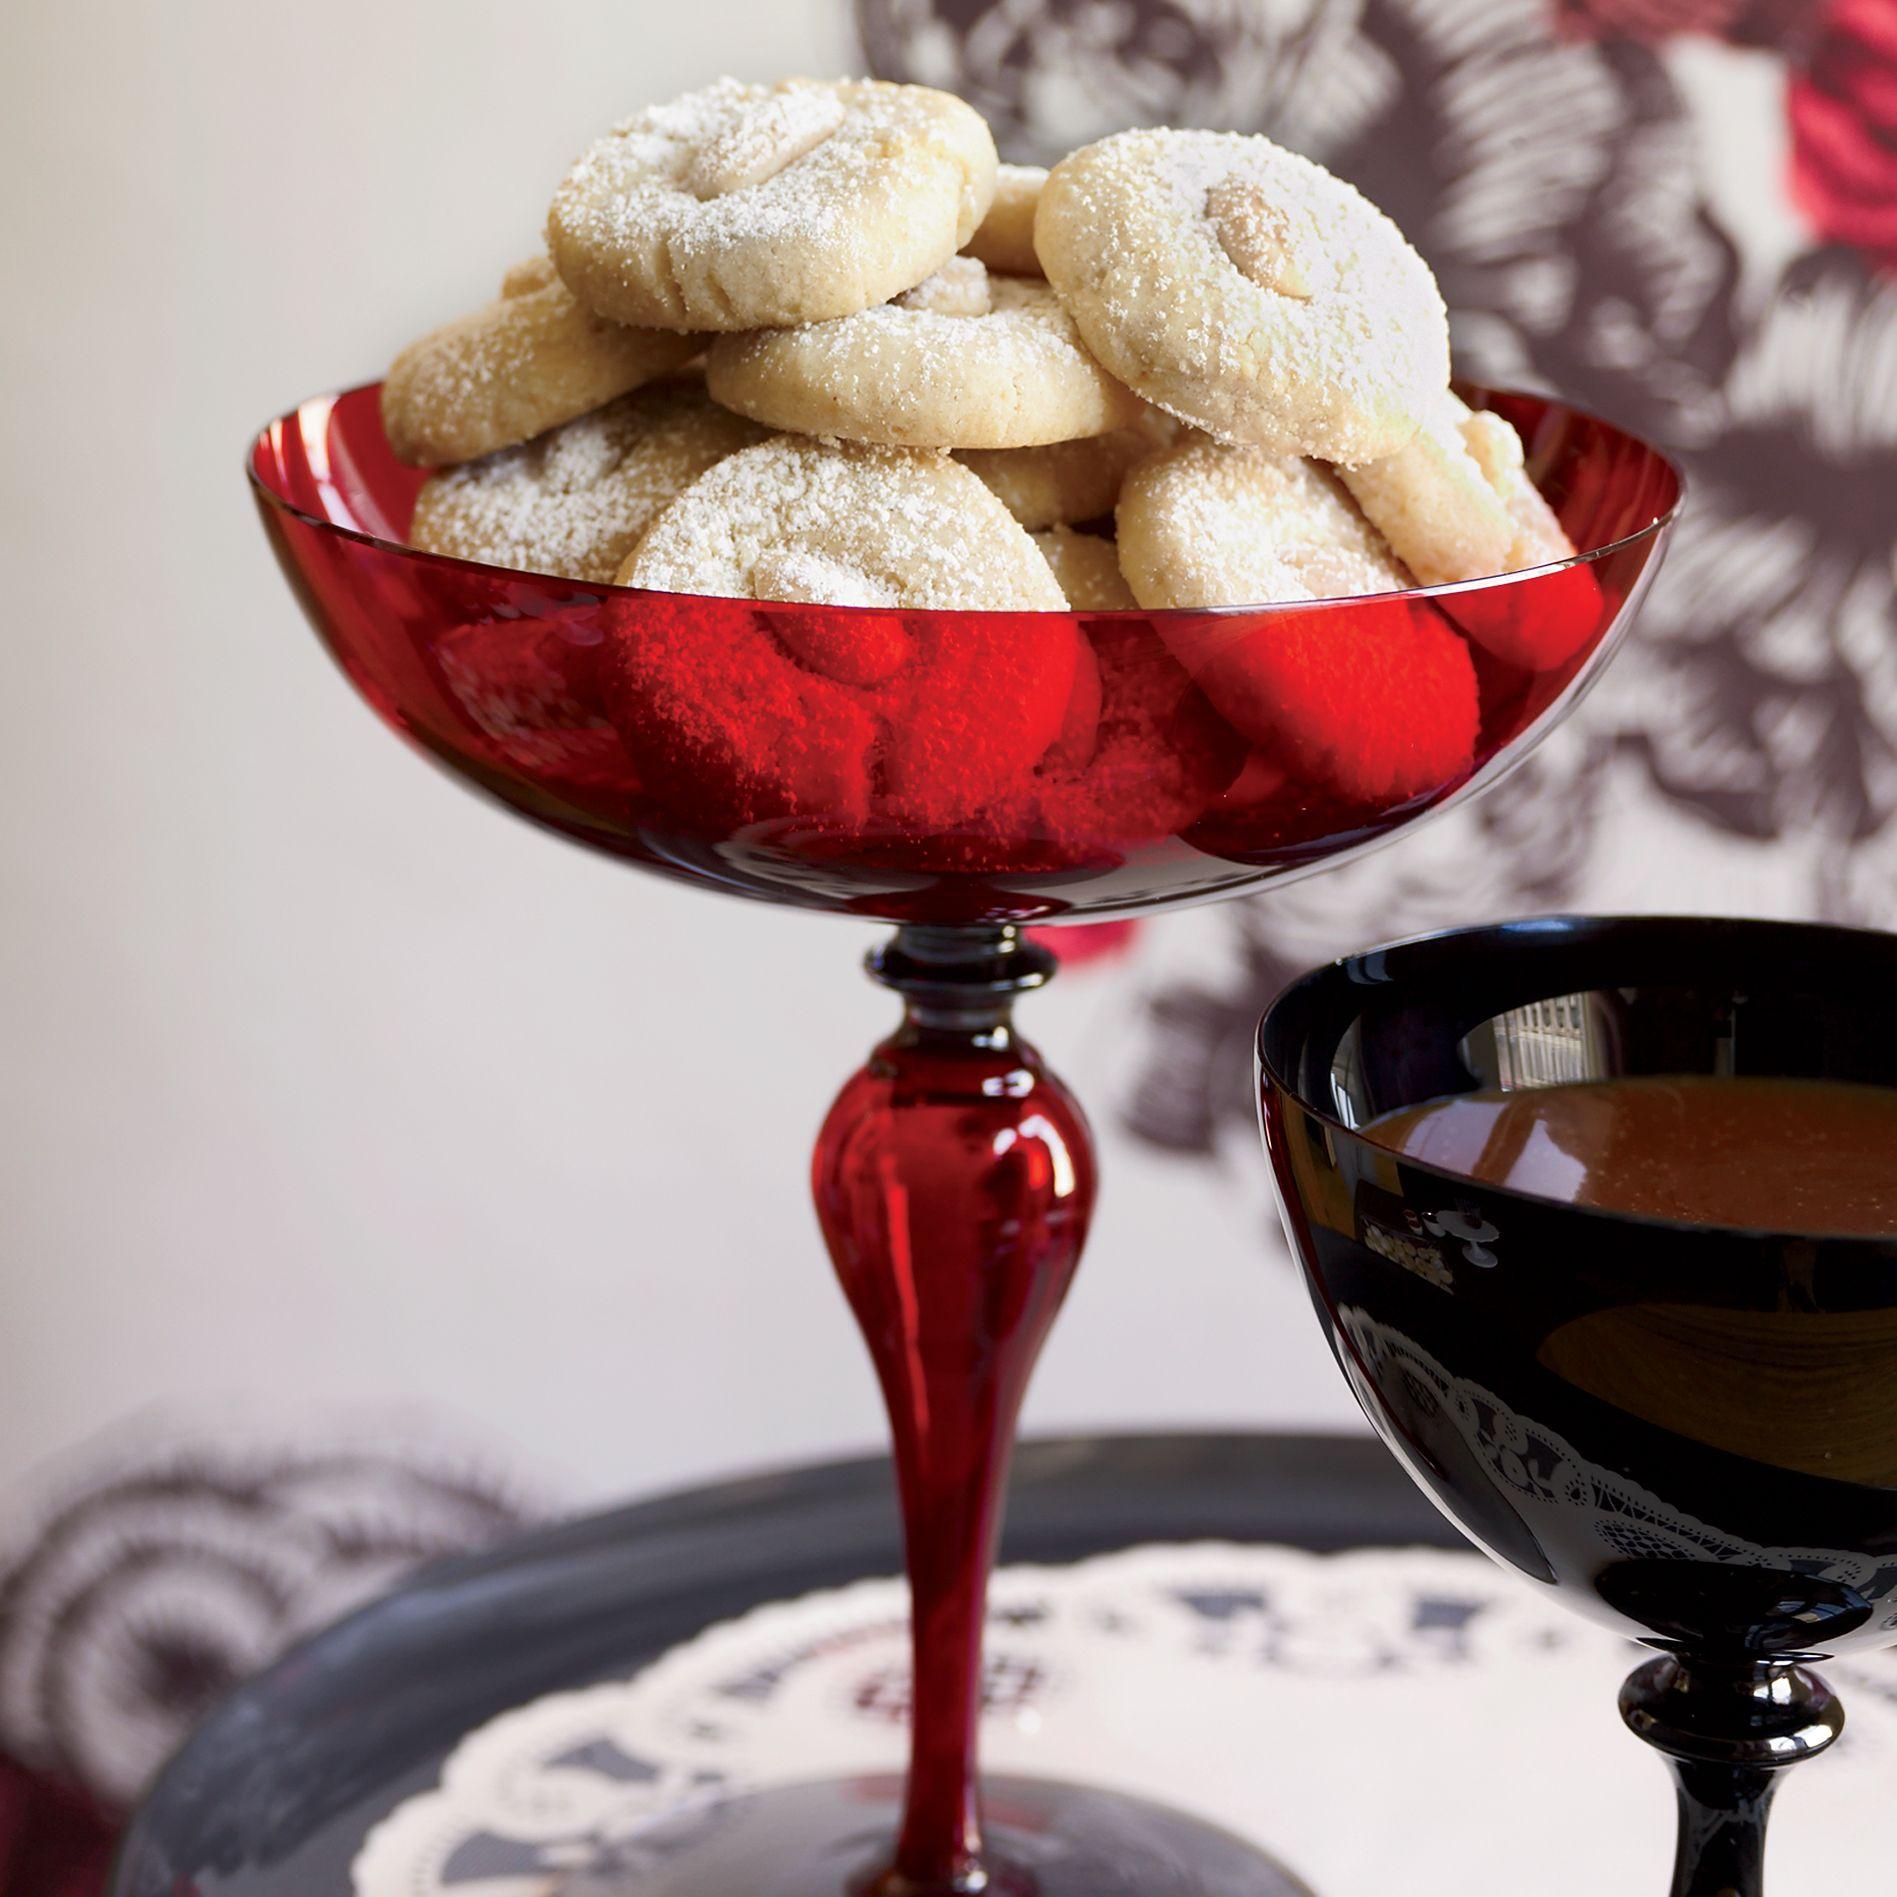 Almond Cookies With Caramel Dipping Sauce Recipe Caramel Dipping Sauce Almond Cookies Caramel Cookies